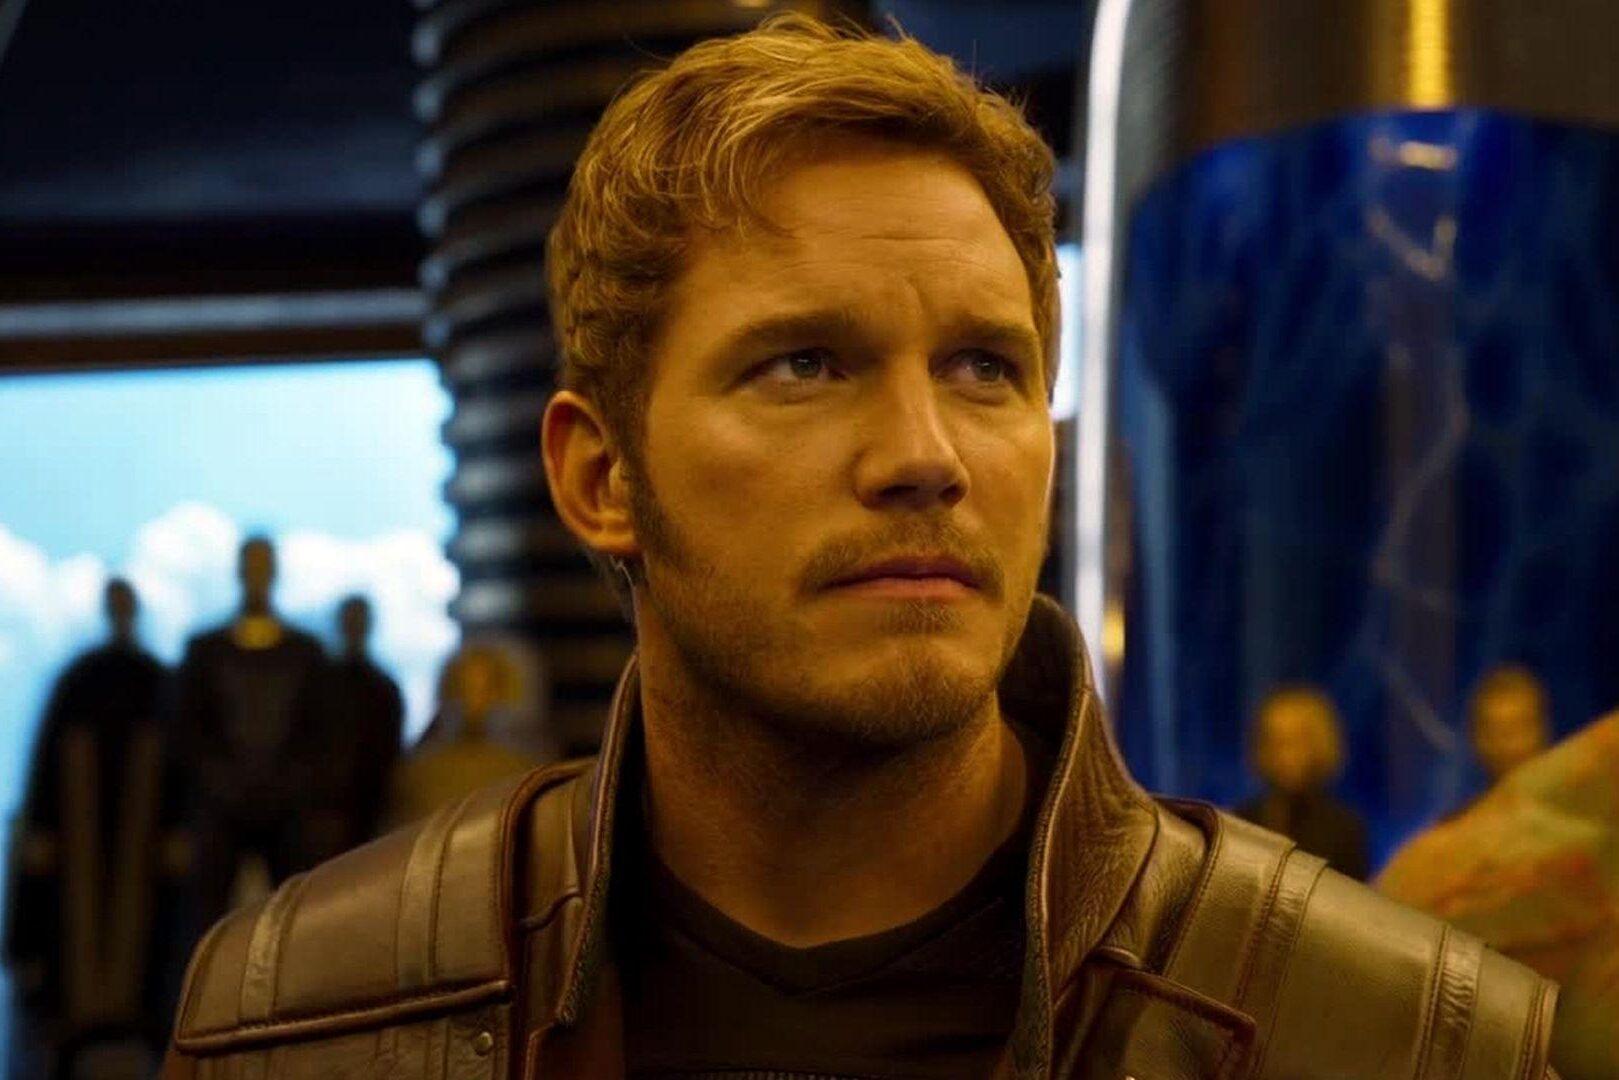 Chris Pratt Star Lord